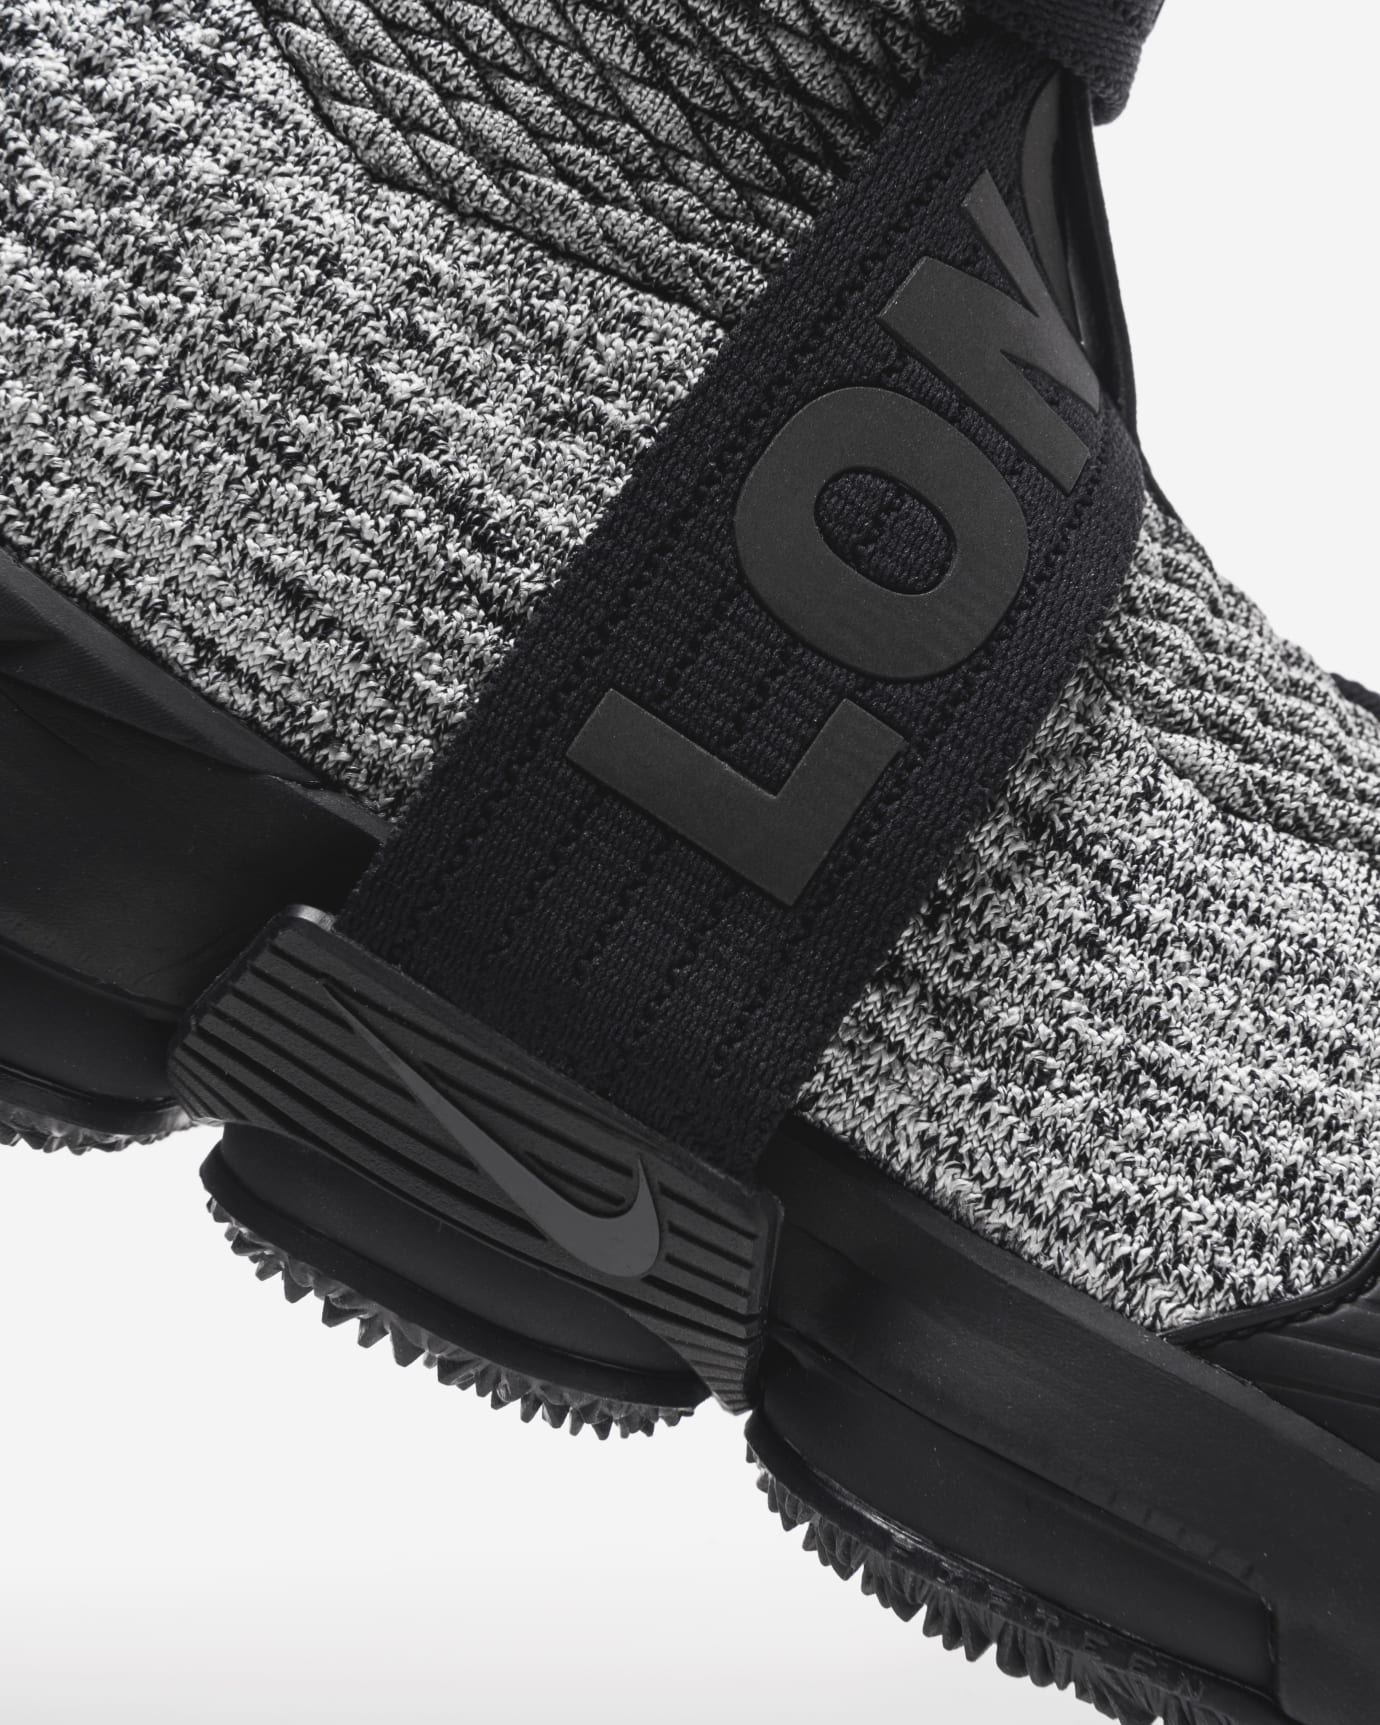 Kith Nike LeBron 15 Ronnie Fieg 4